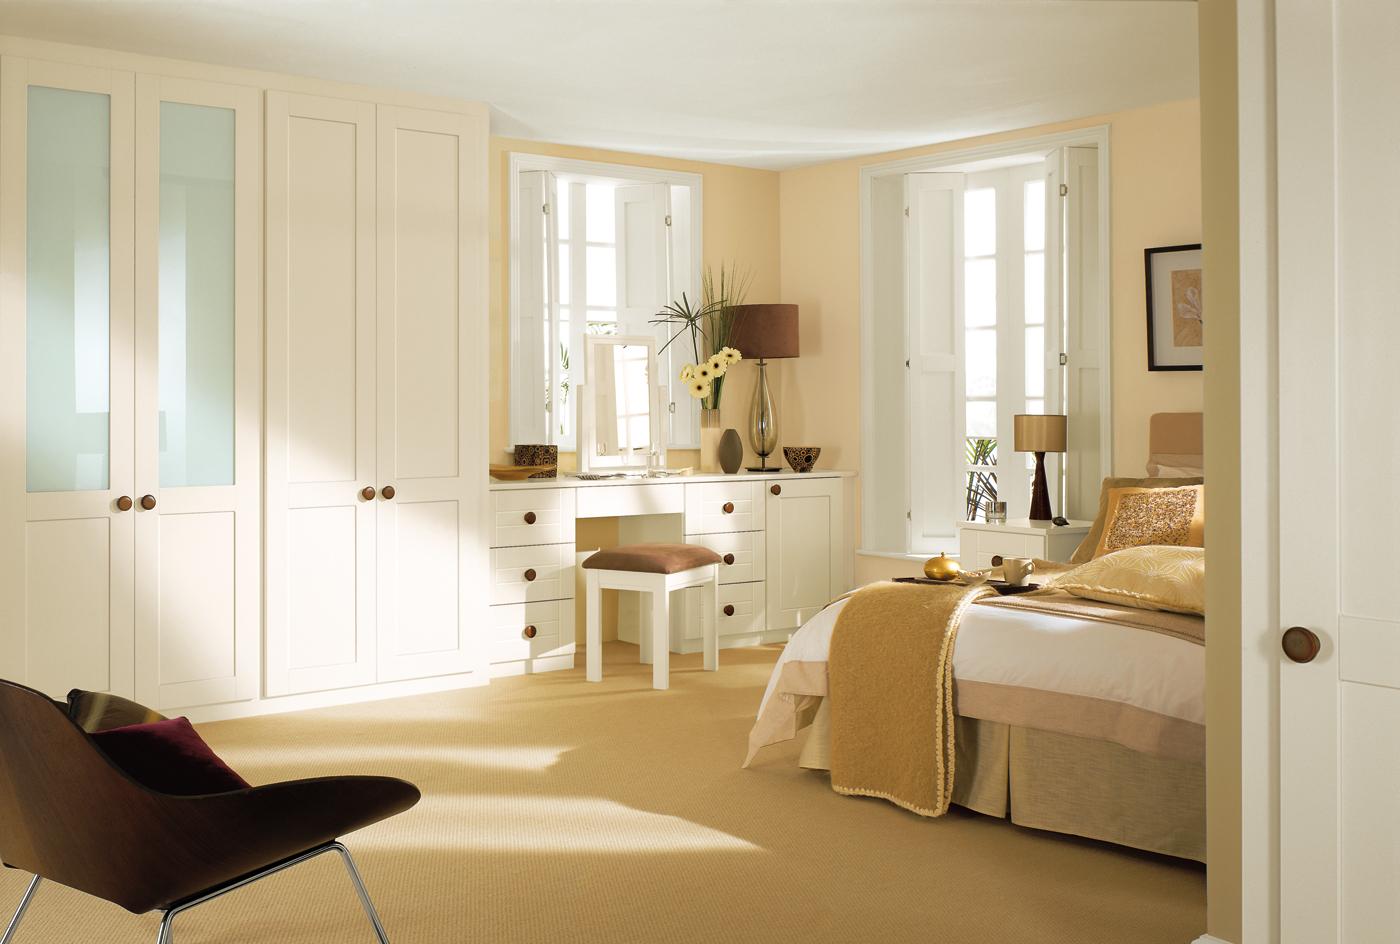 example of a built in bedroom furniturebedroom design decorating ideas